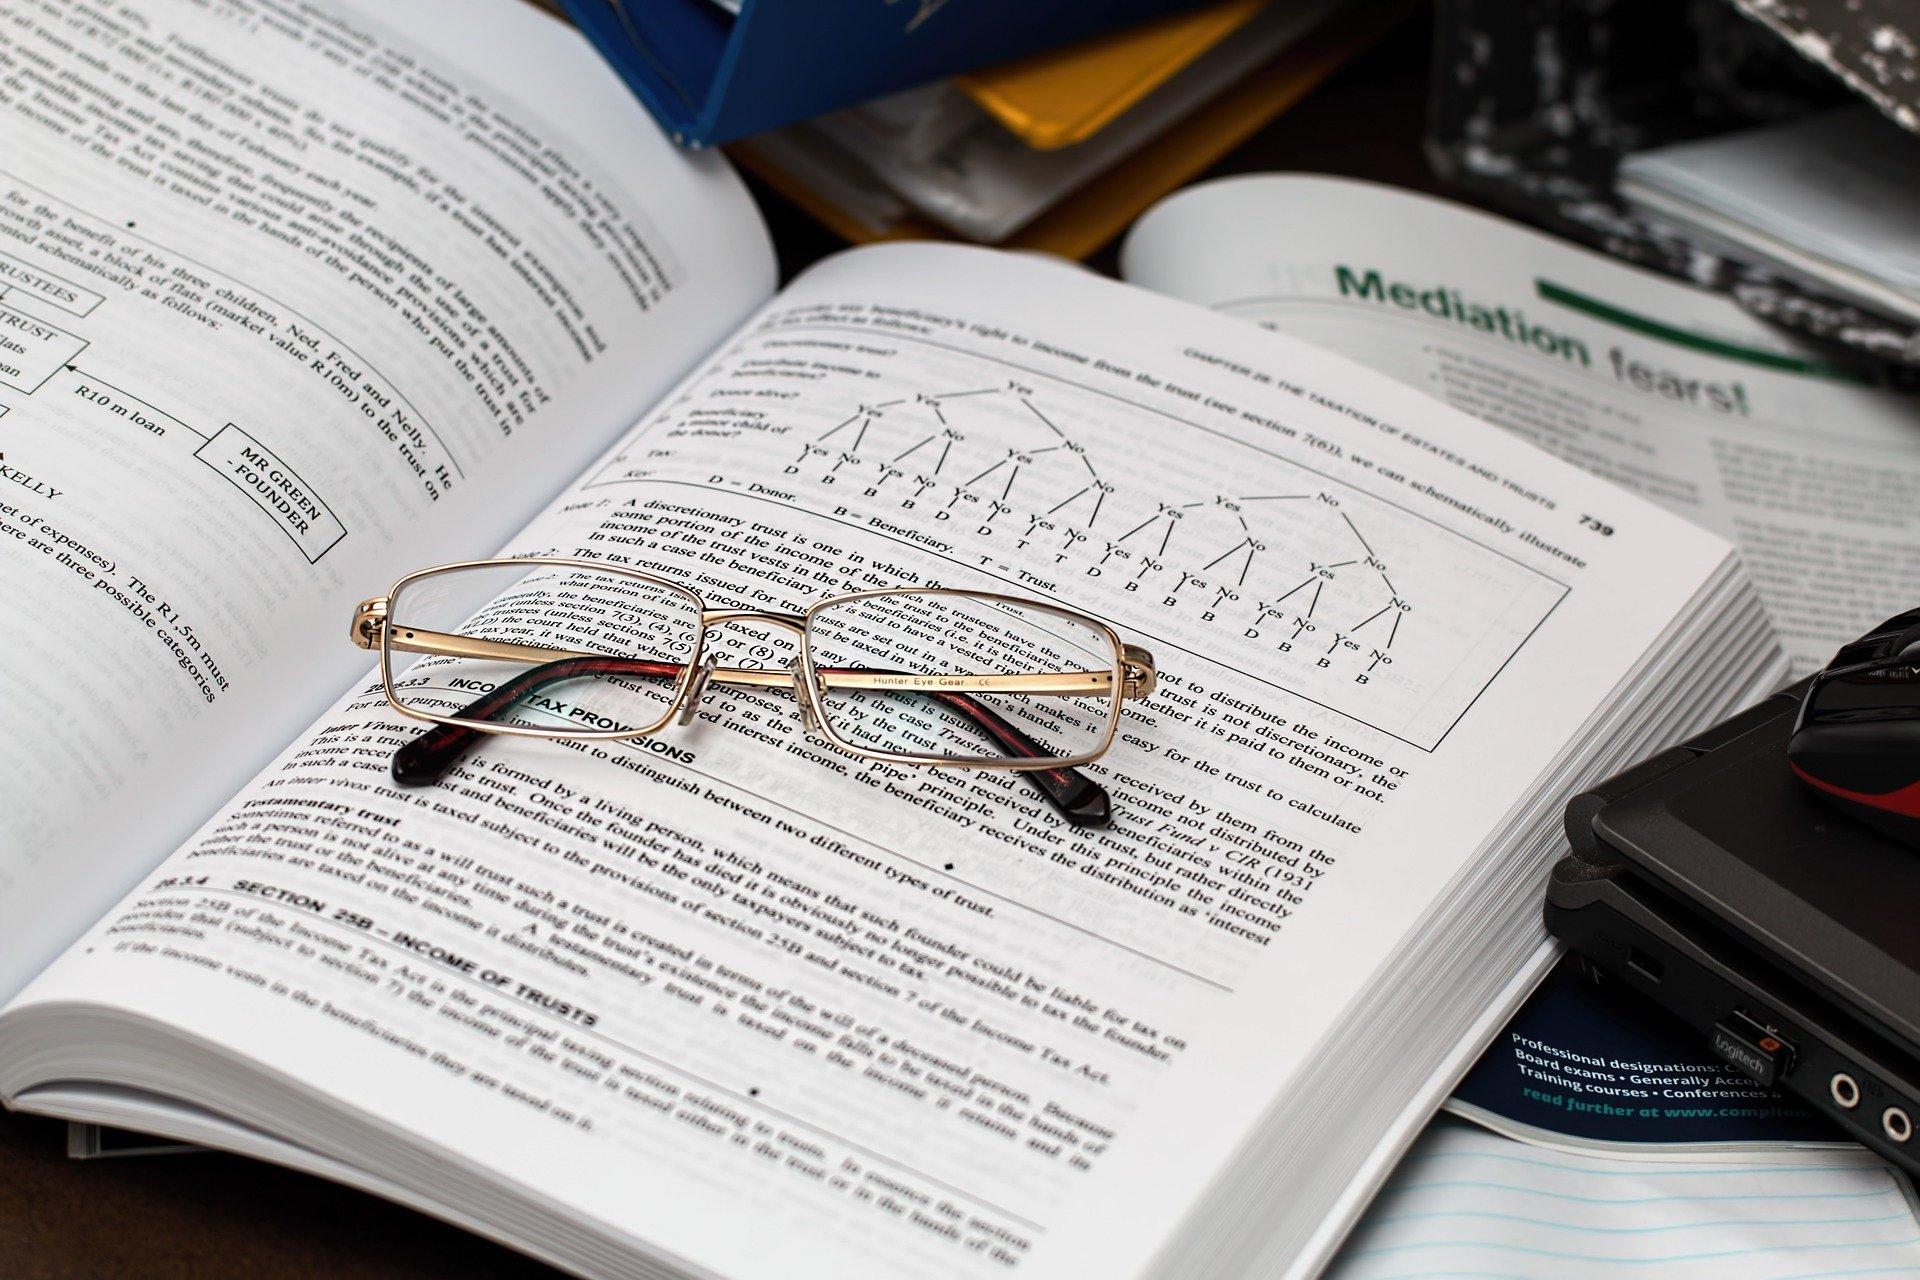 Diplôme d'expert-comptable